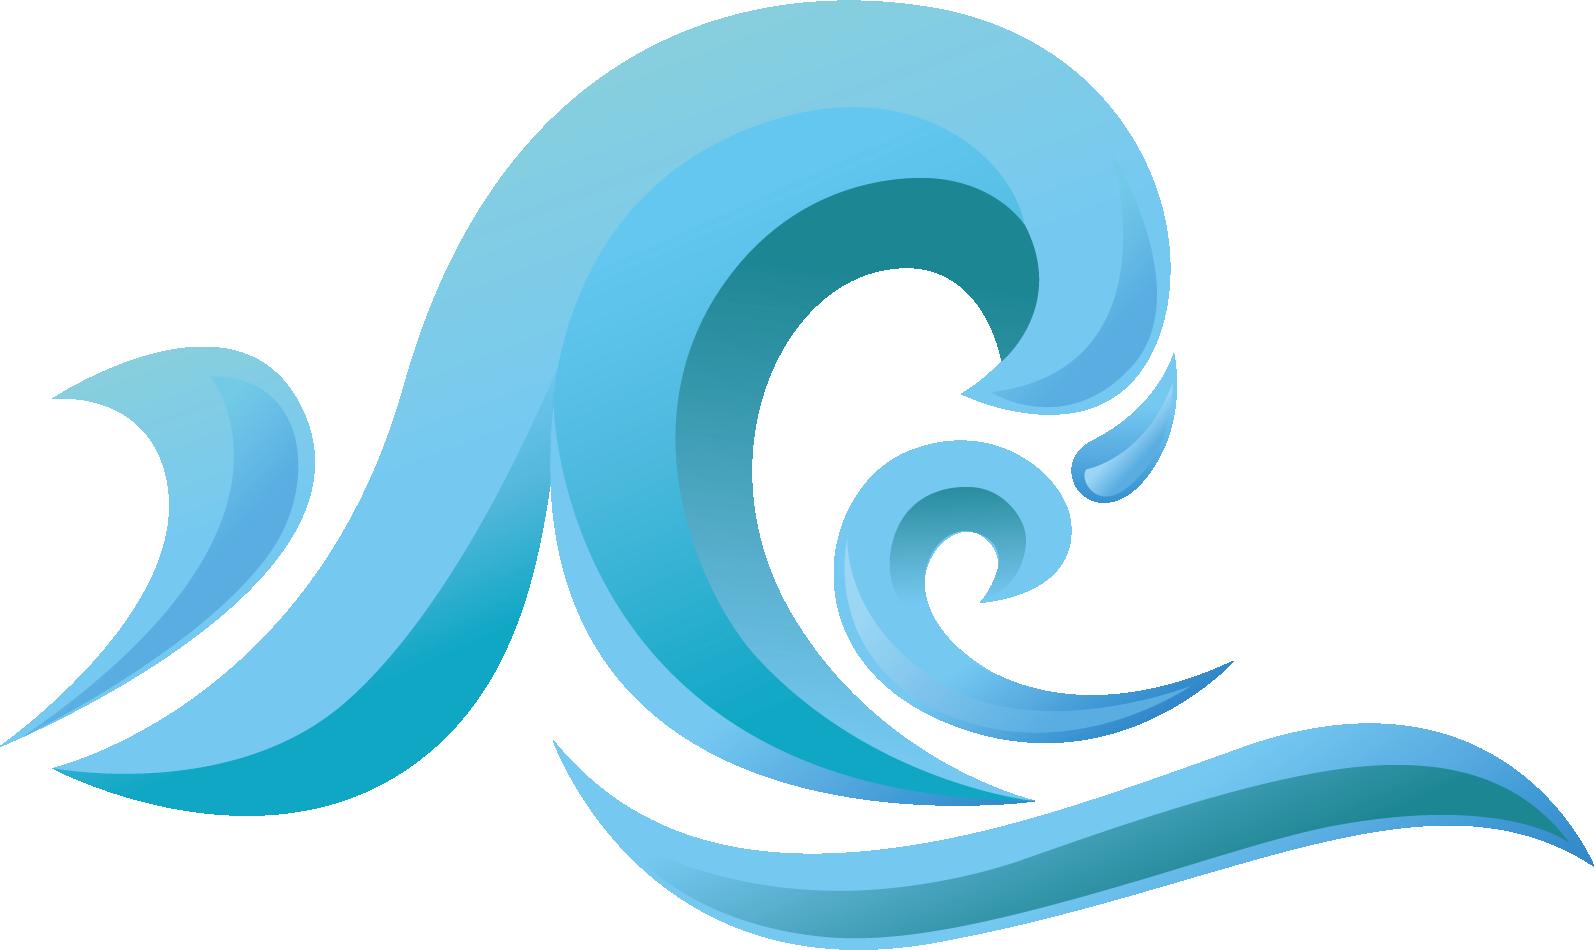 Wind material picture transprent. Splash clipart beach wave